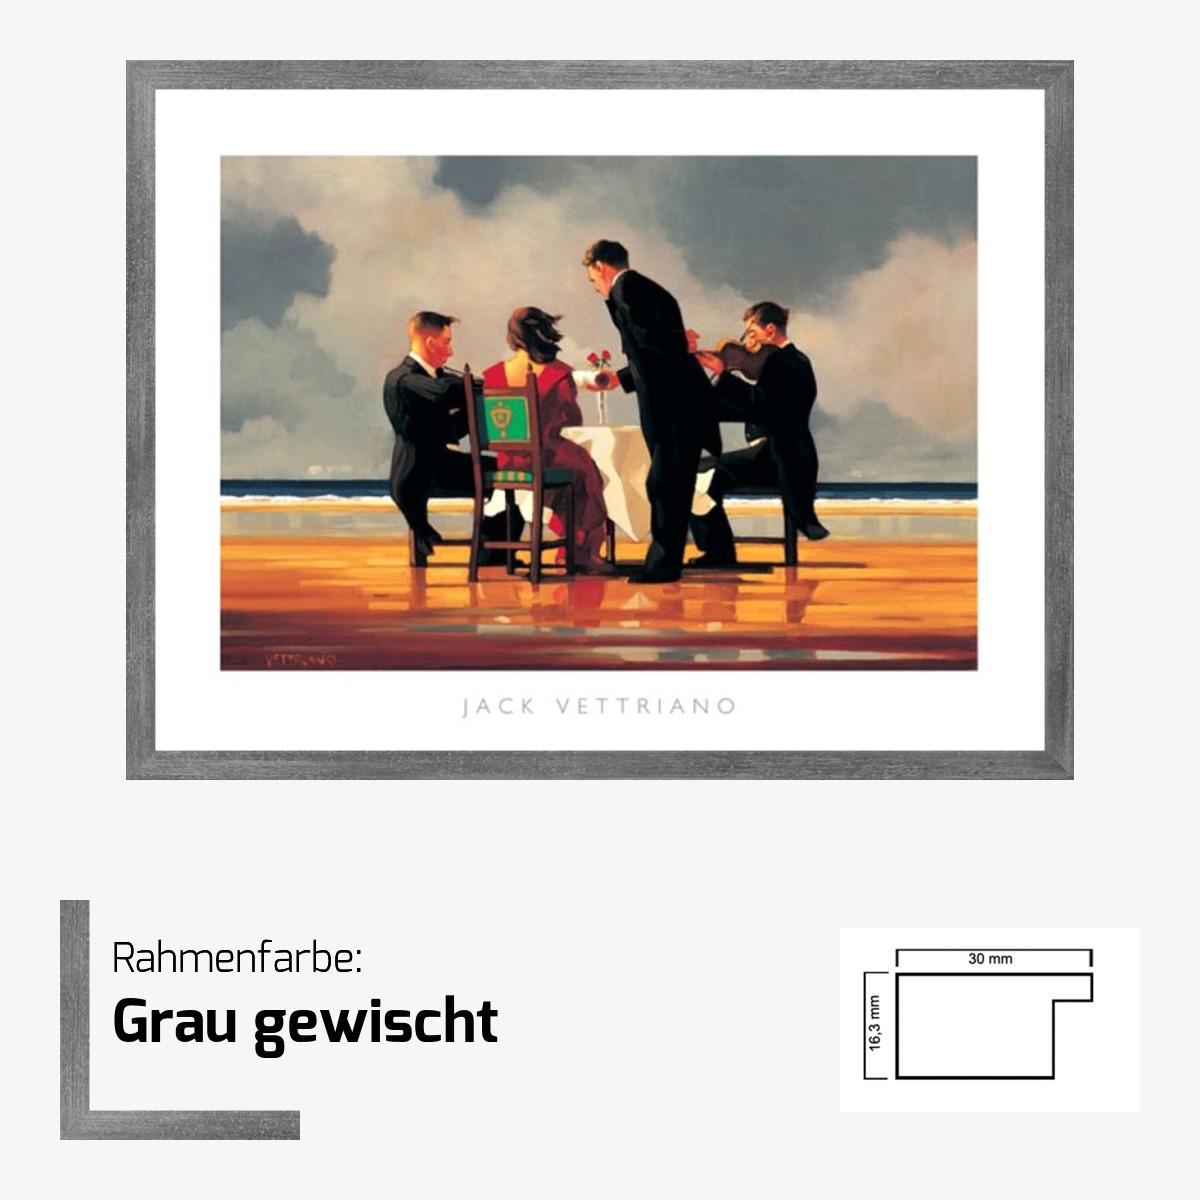 kunstdruck vettriano dead admiral 80 x 60 cm optional bilderrahmen cliprahmen ebay. Black Bedroom Furniture Sets. Home Design Ideas